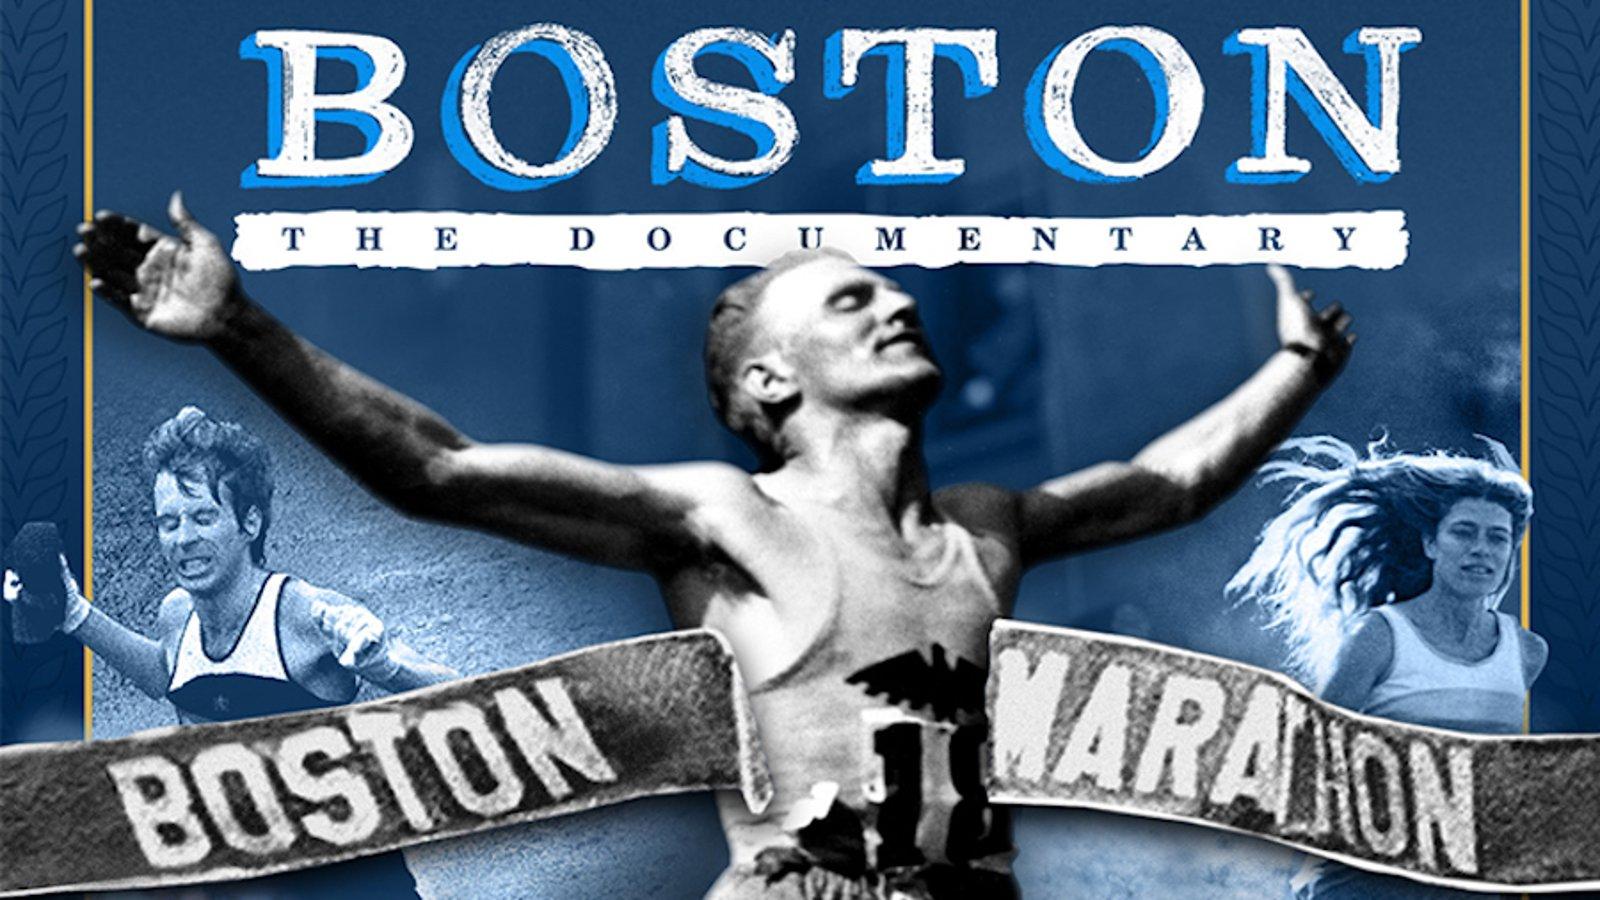 Boston - The History of the Boston Marathon